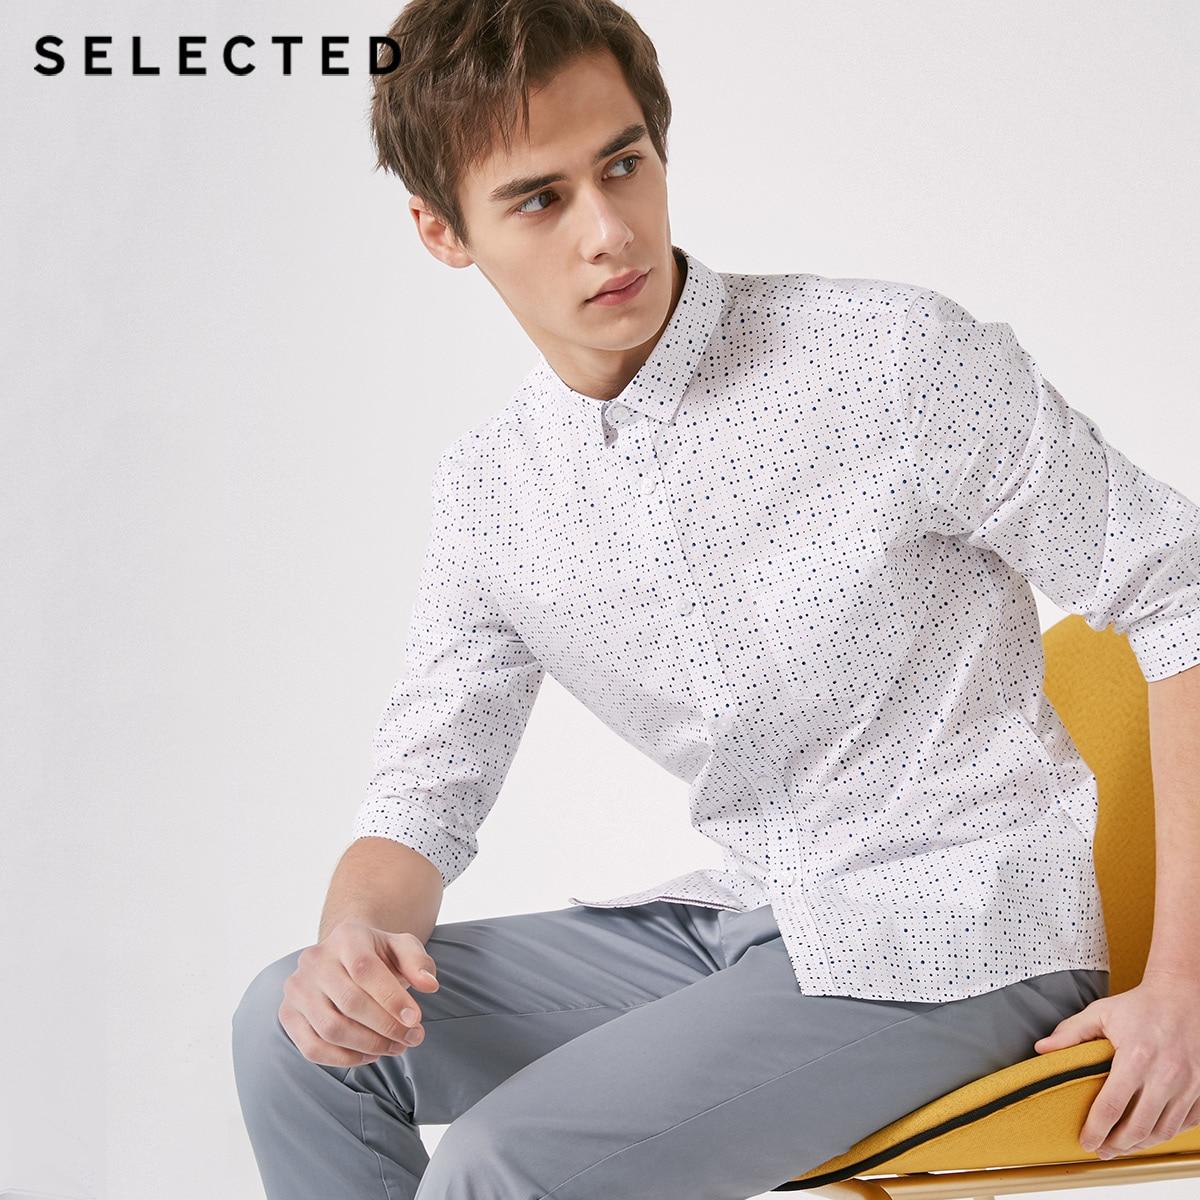 SELECTED Men's Slim Fit Polka-dot Trendy Slim Casual Cropped 3/4 Sleeves Shirt S|419131501